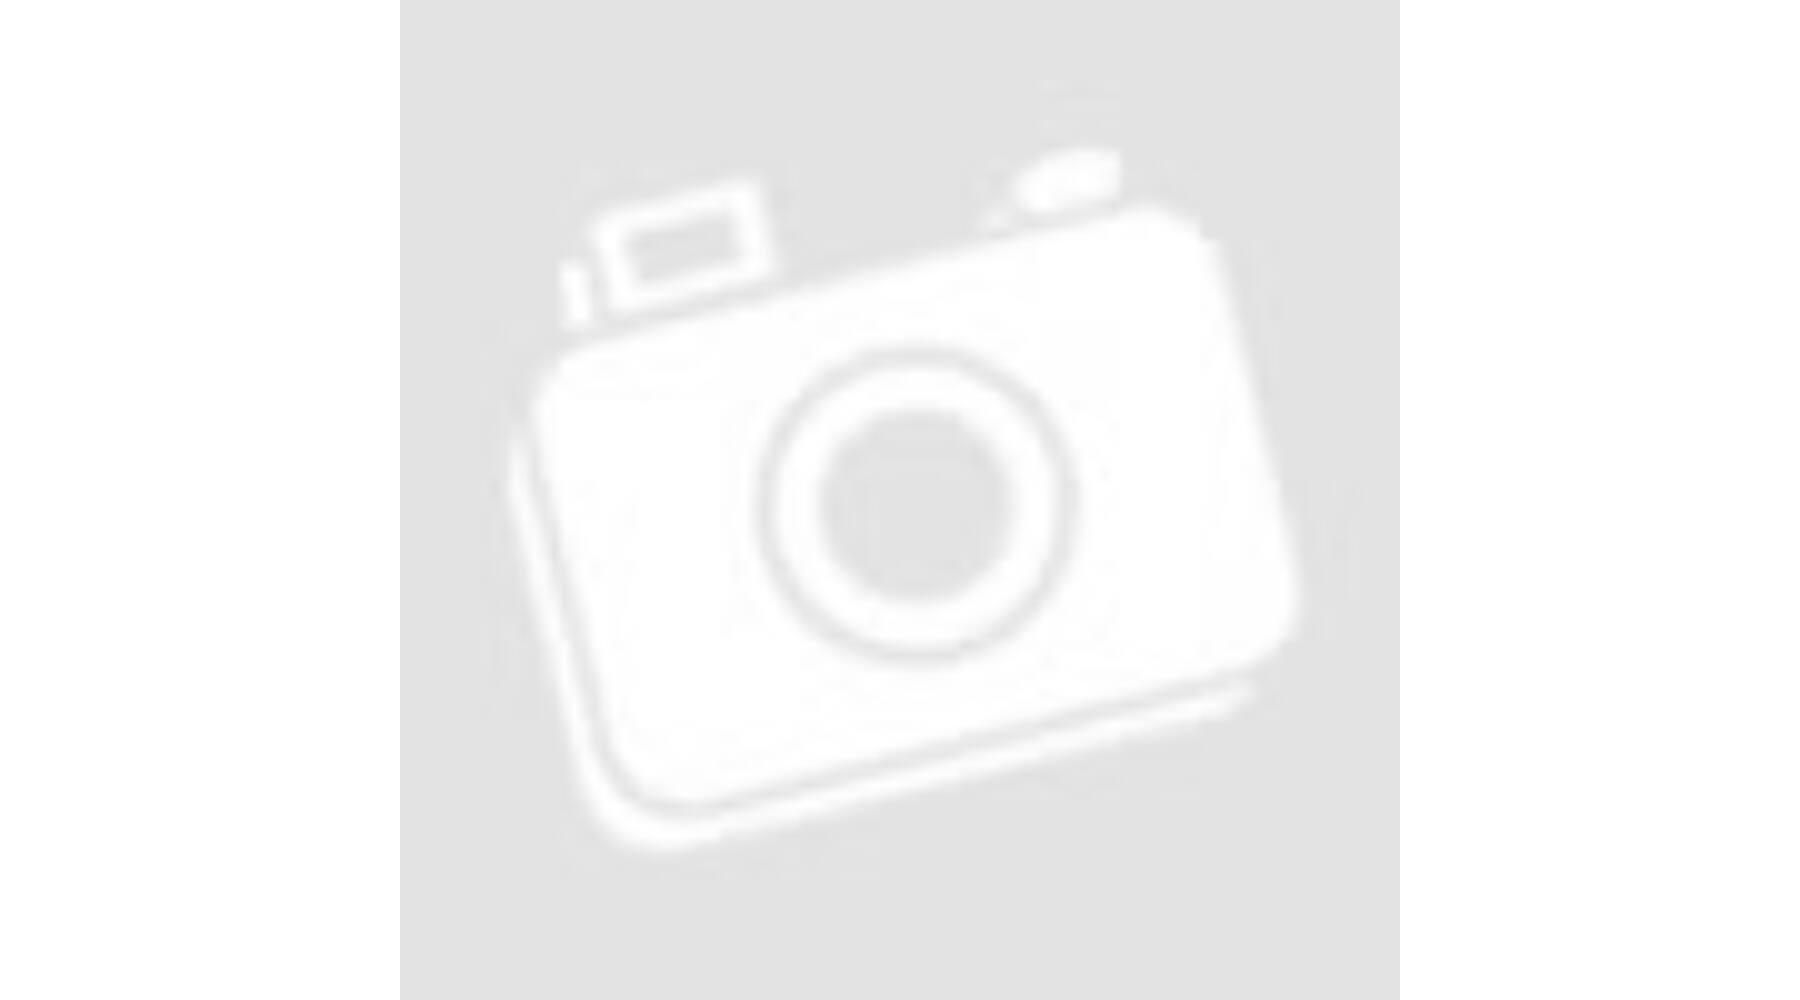 a0542116b2 virágos lenge női buggyos nadrág hosszú - Nadrágok - ZenudaShop ...